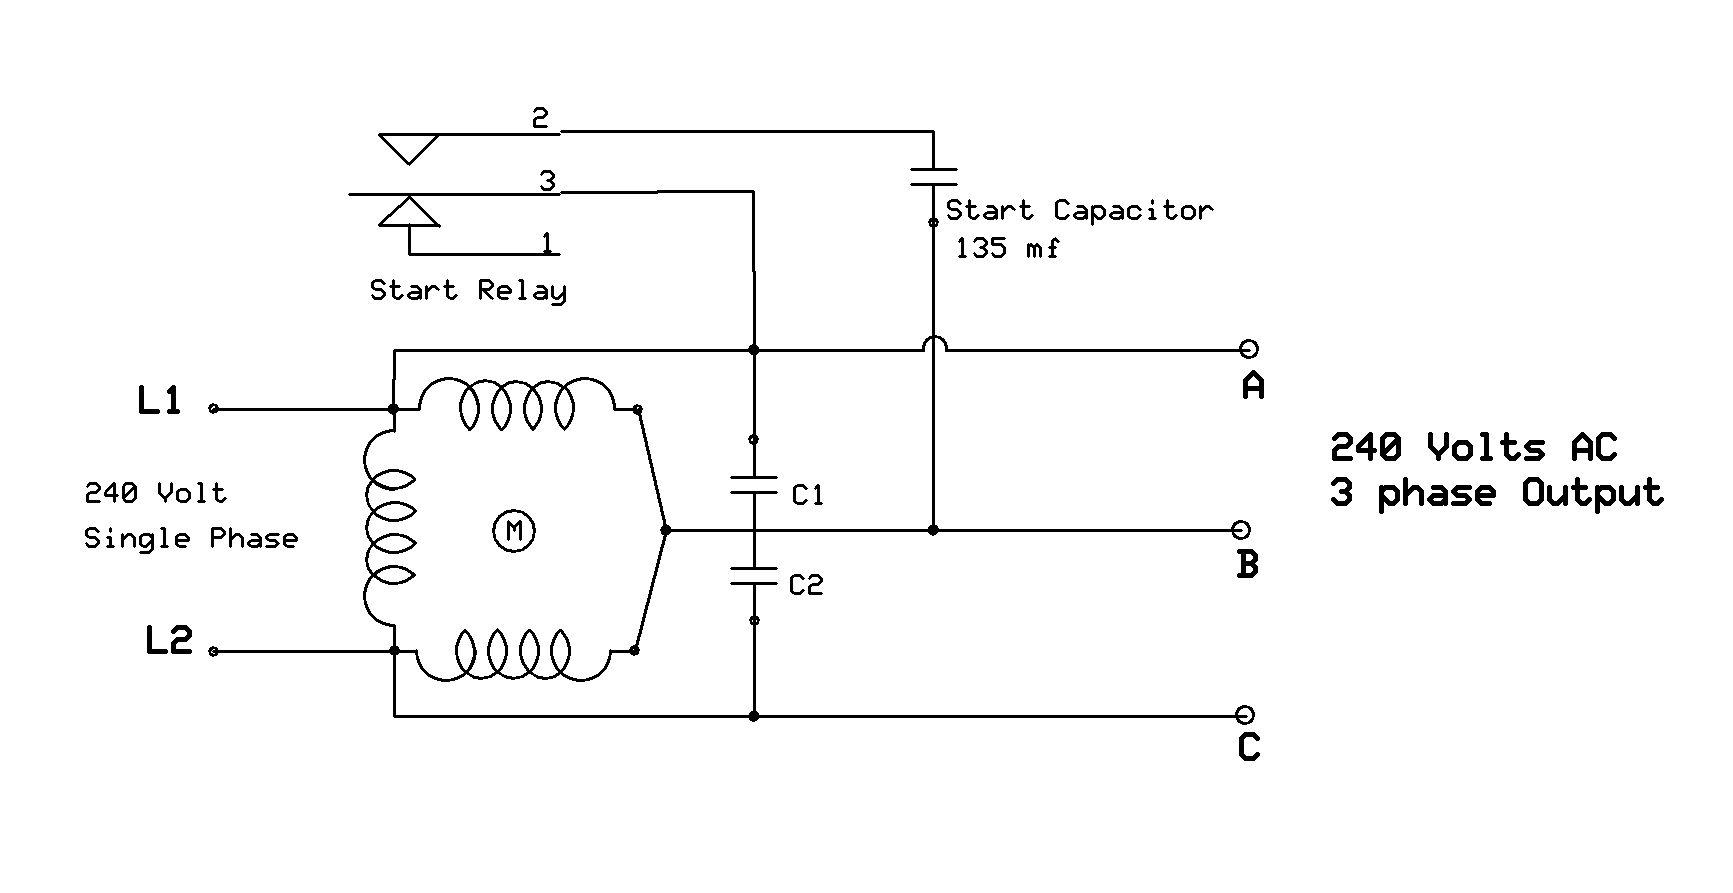 240v motor wiring diagram single phase Collection-Motor Starting Capacitor Guide Readingratnet Wiring Inside Single Incredible Start Diagram 7-r